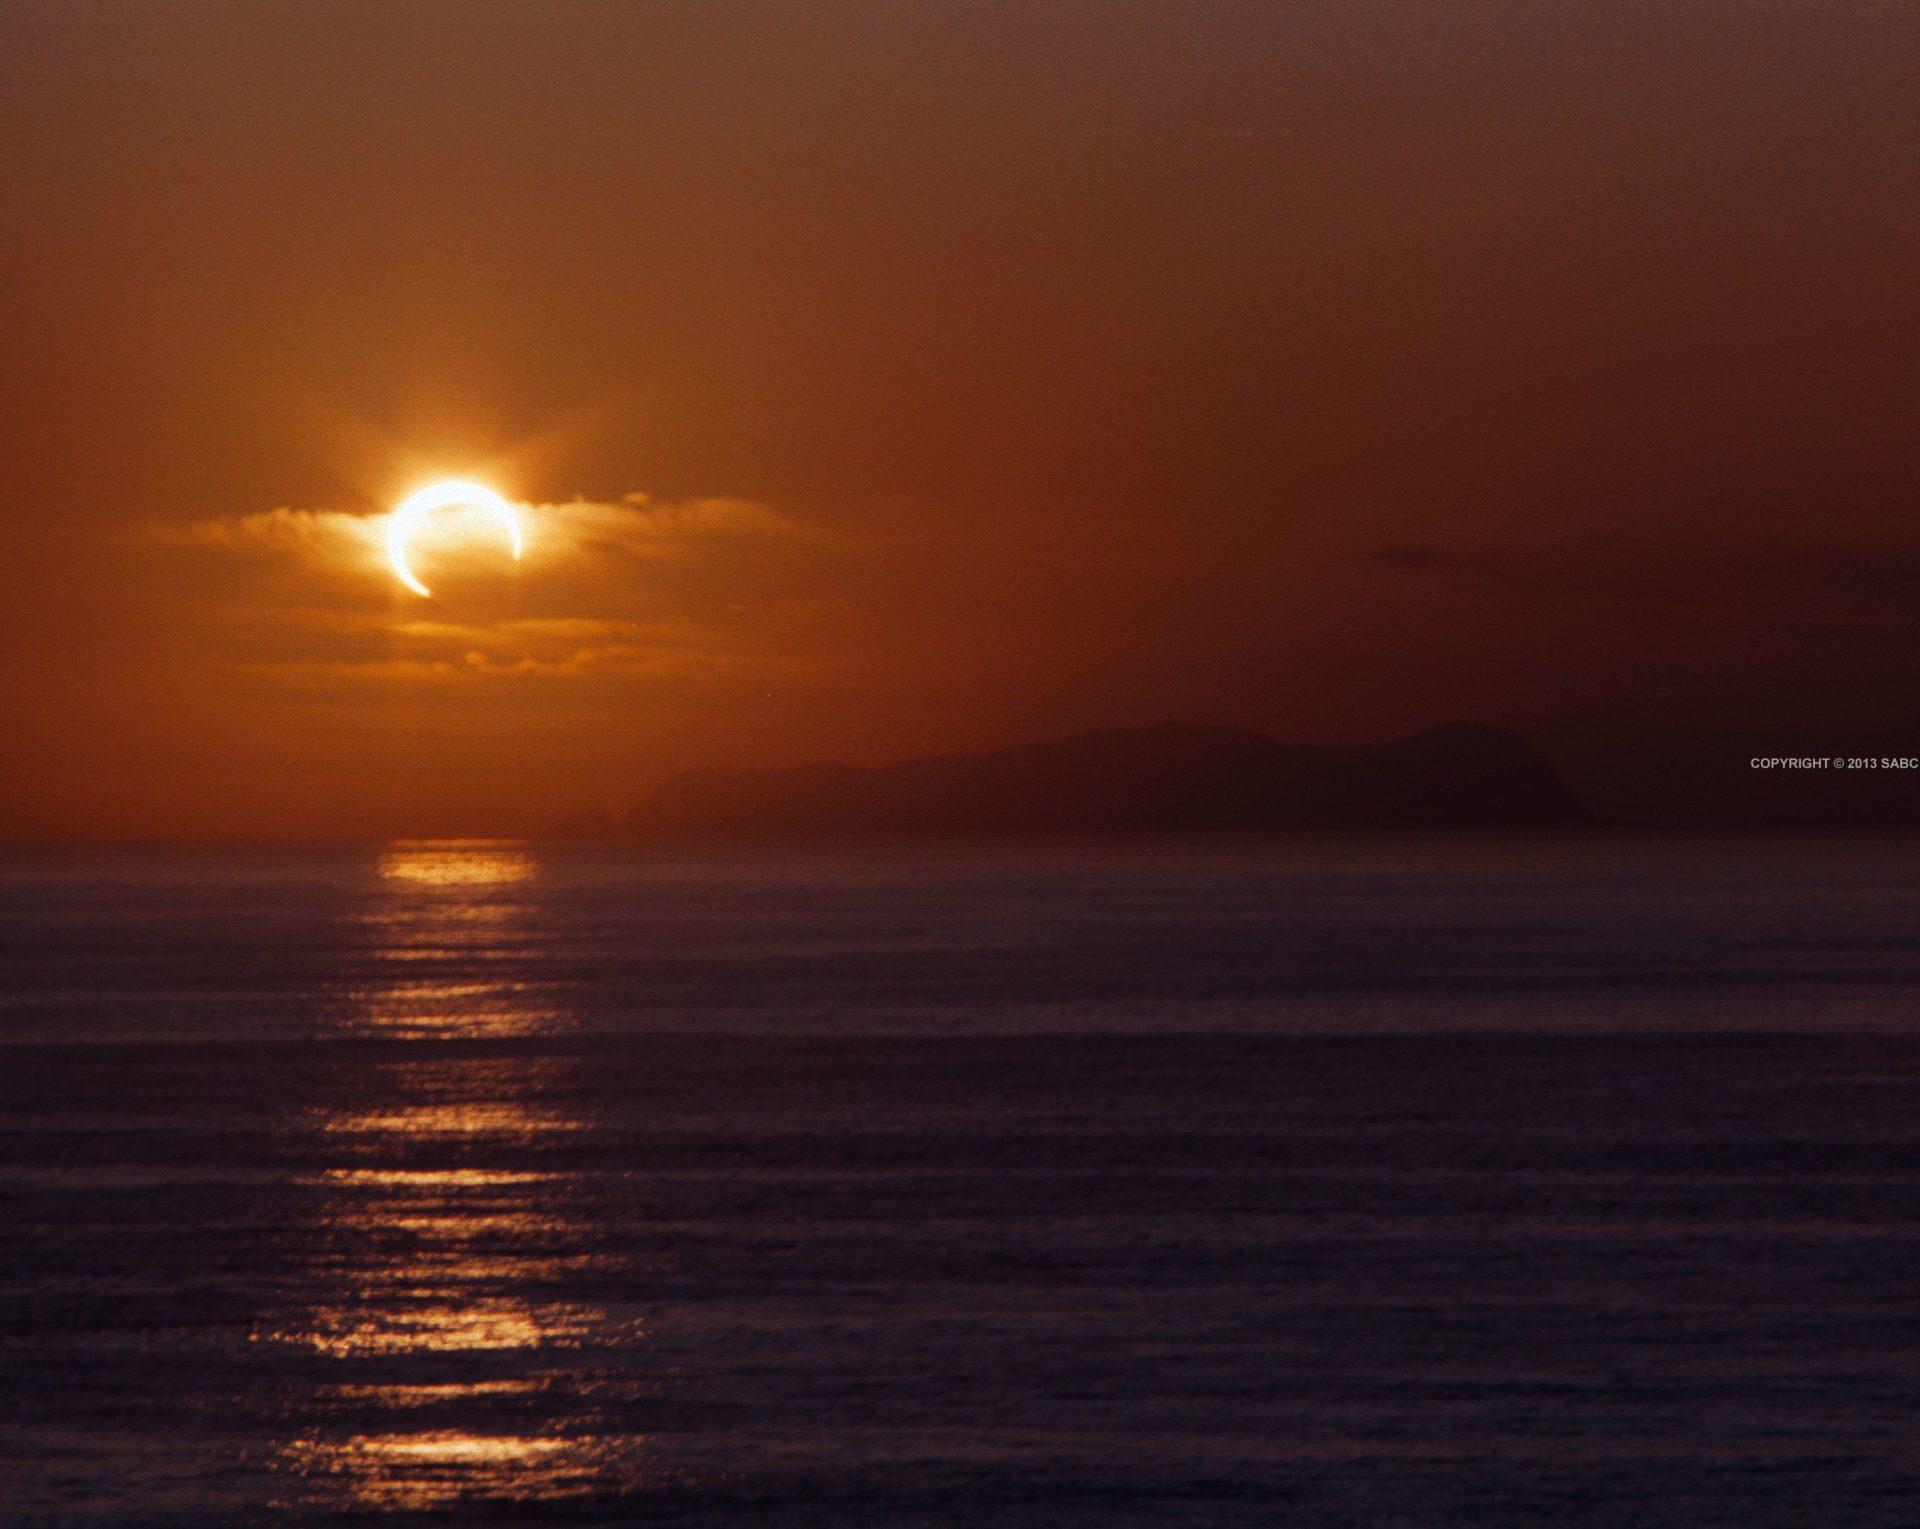 Eclipse anular Enero '92. copyright Adolfo Baltazar